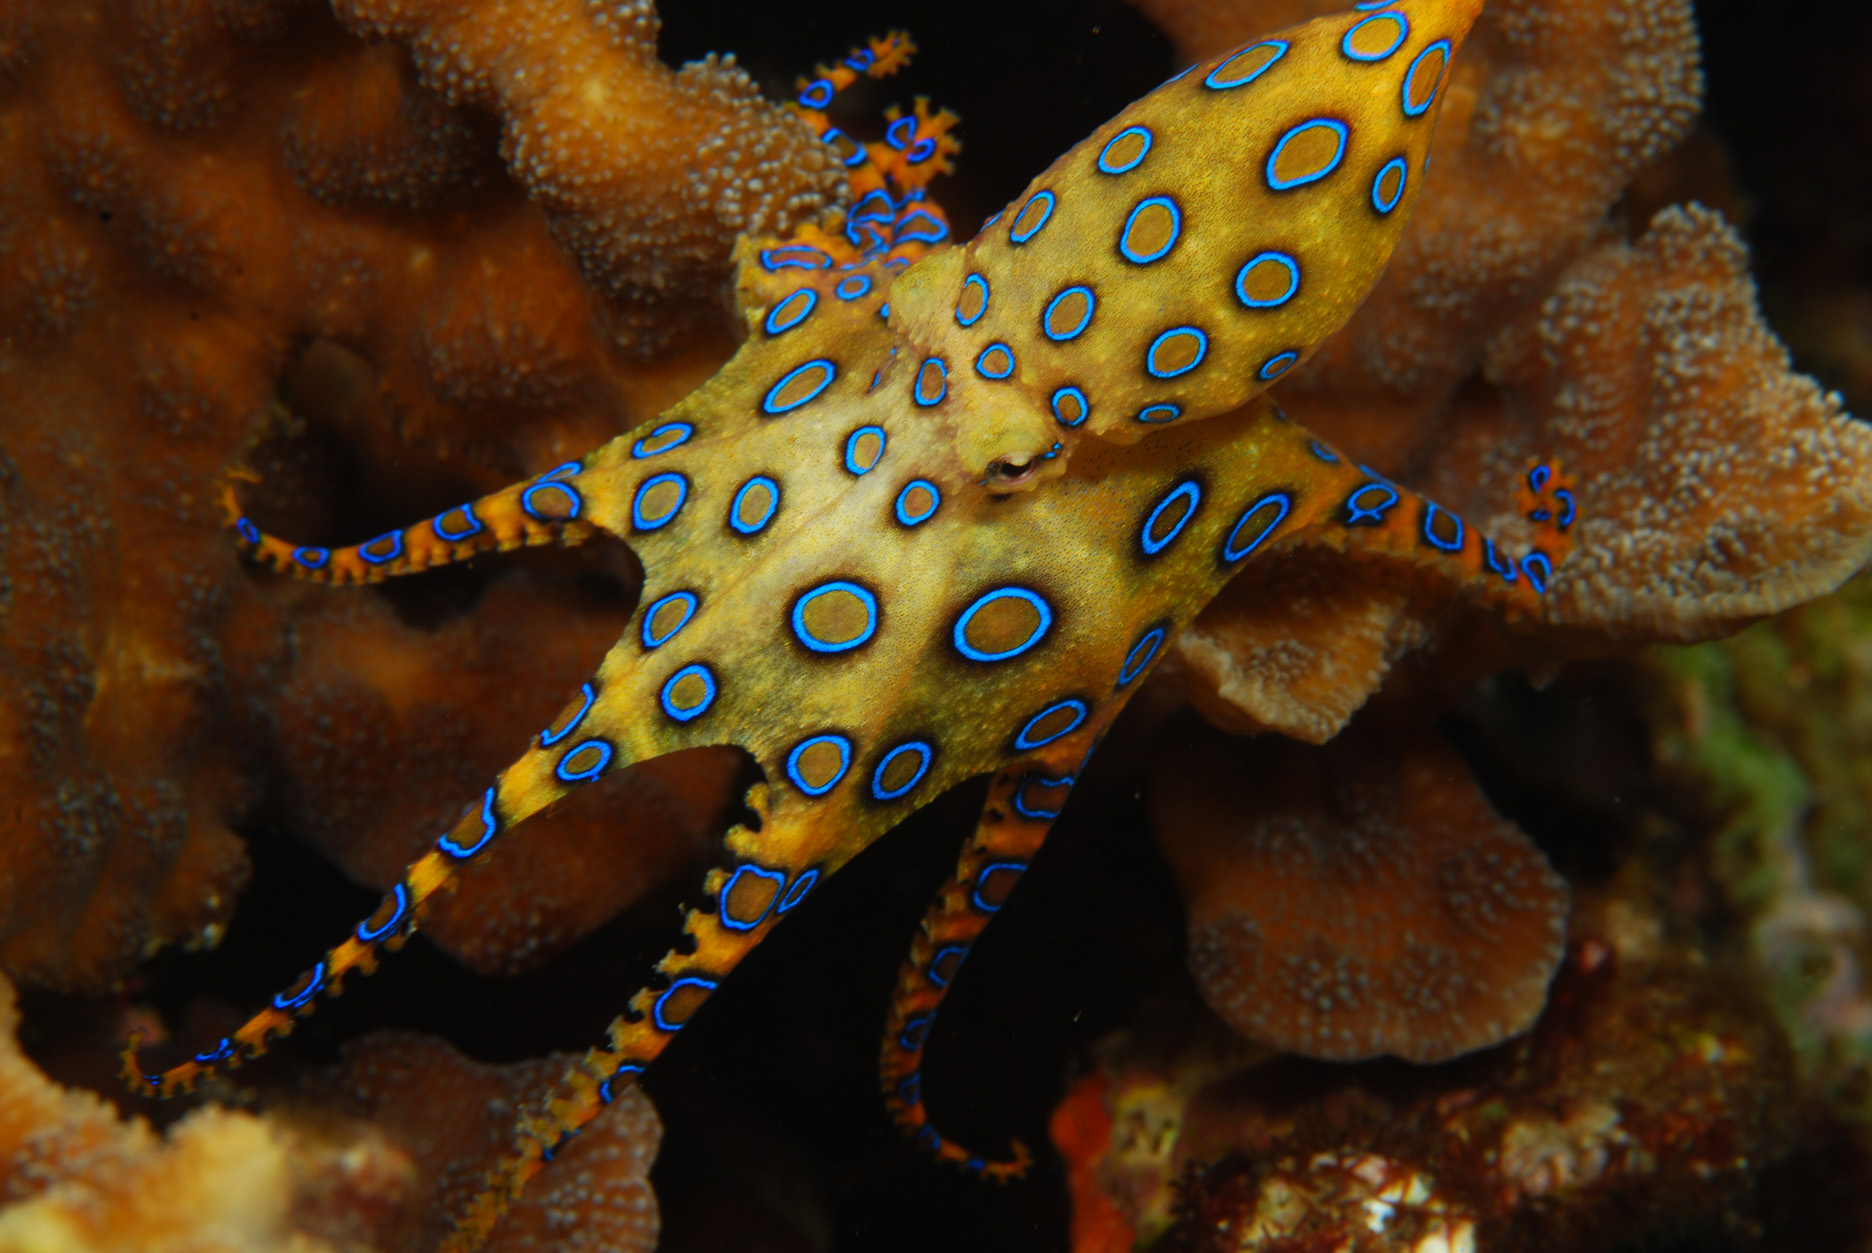 Blue octopus - photo#1